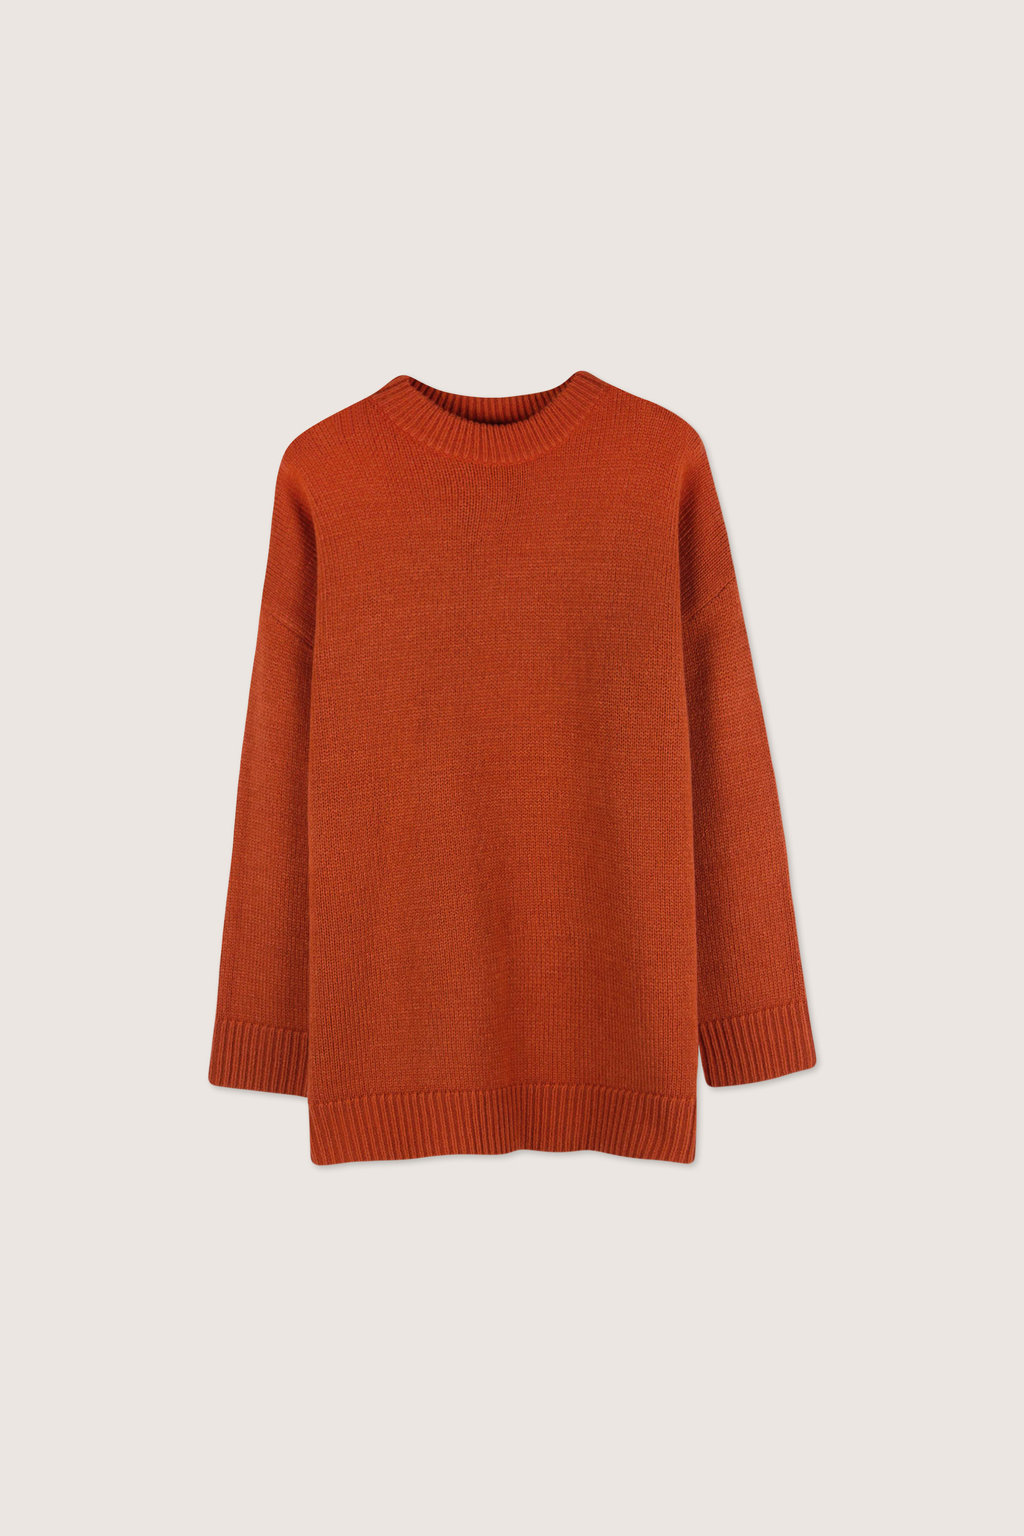 Sweater 1826 Orange 9